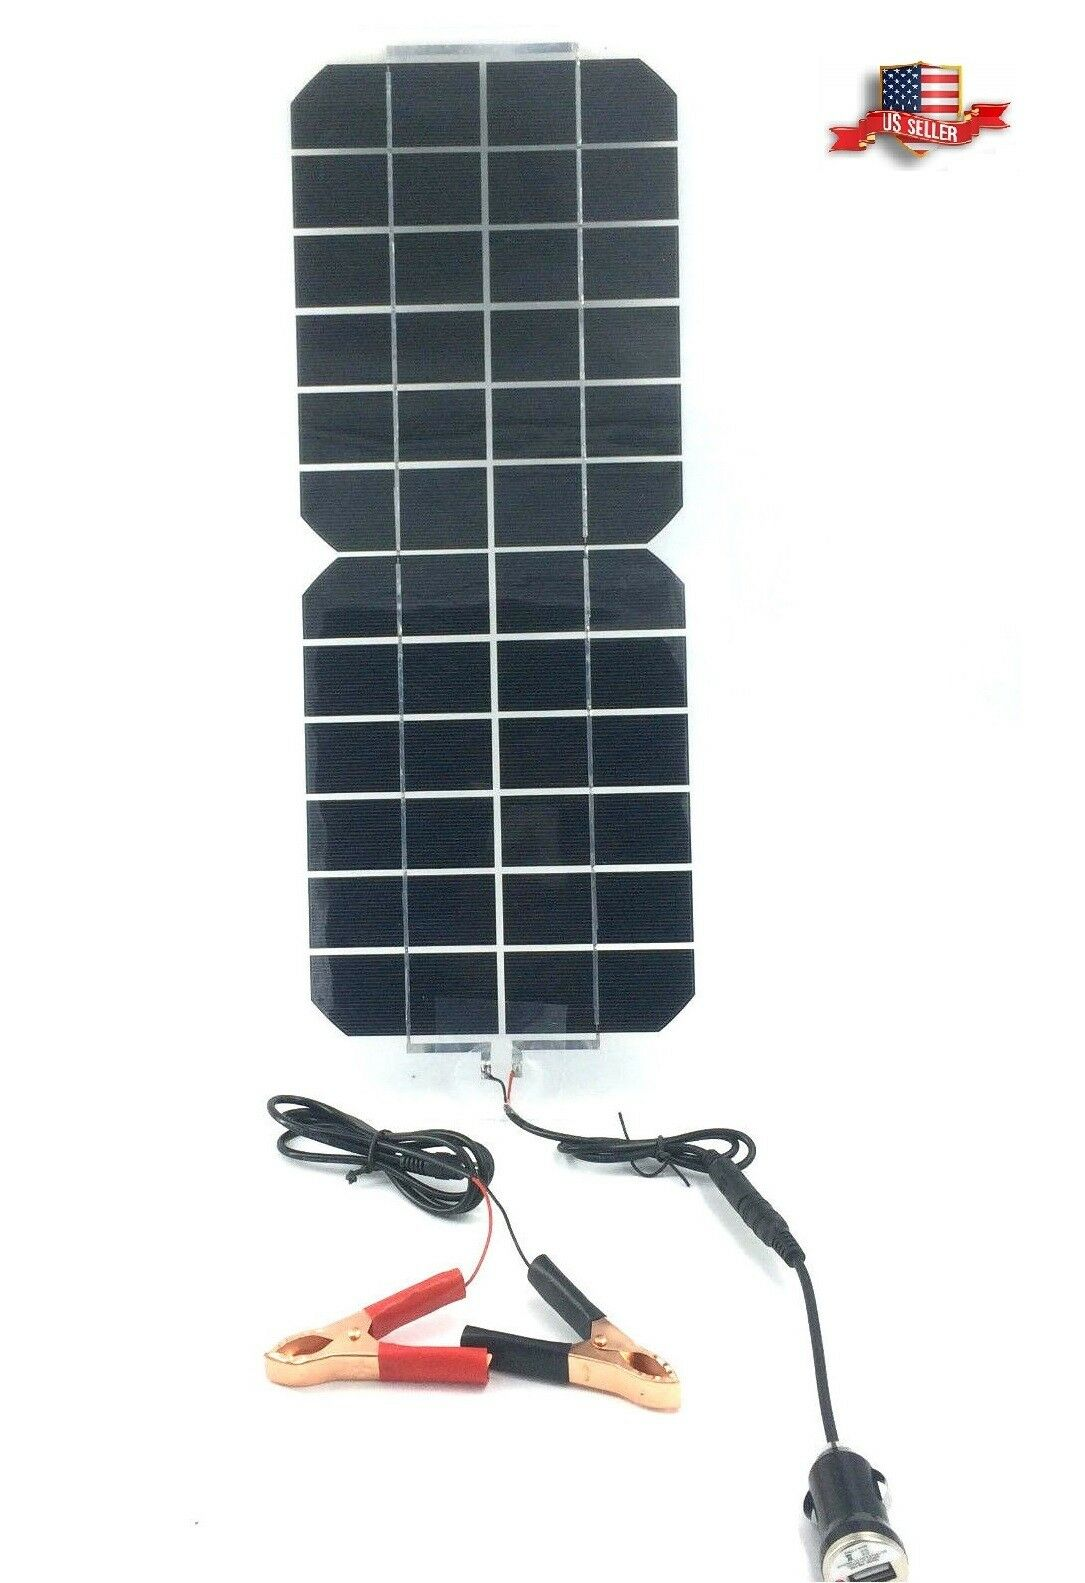 5W 12V/5V DC Waterproof Battery Solar Panel USB Home Phone R